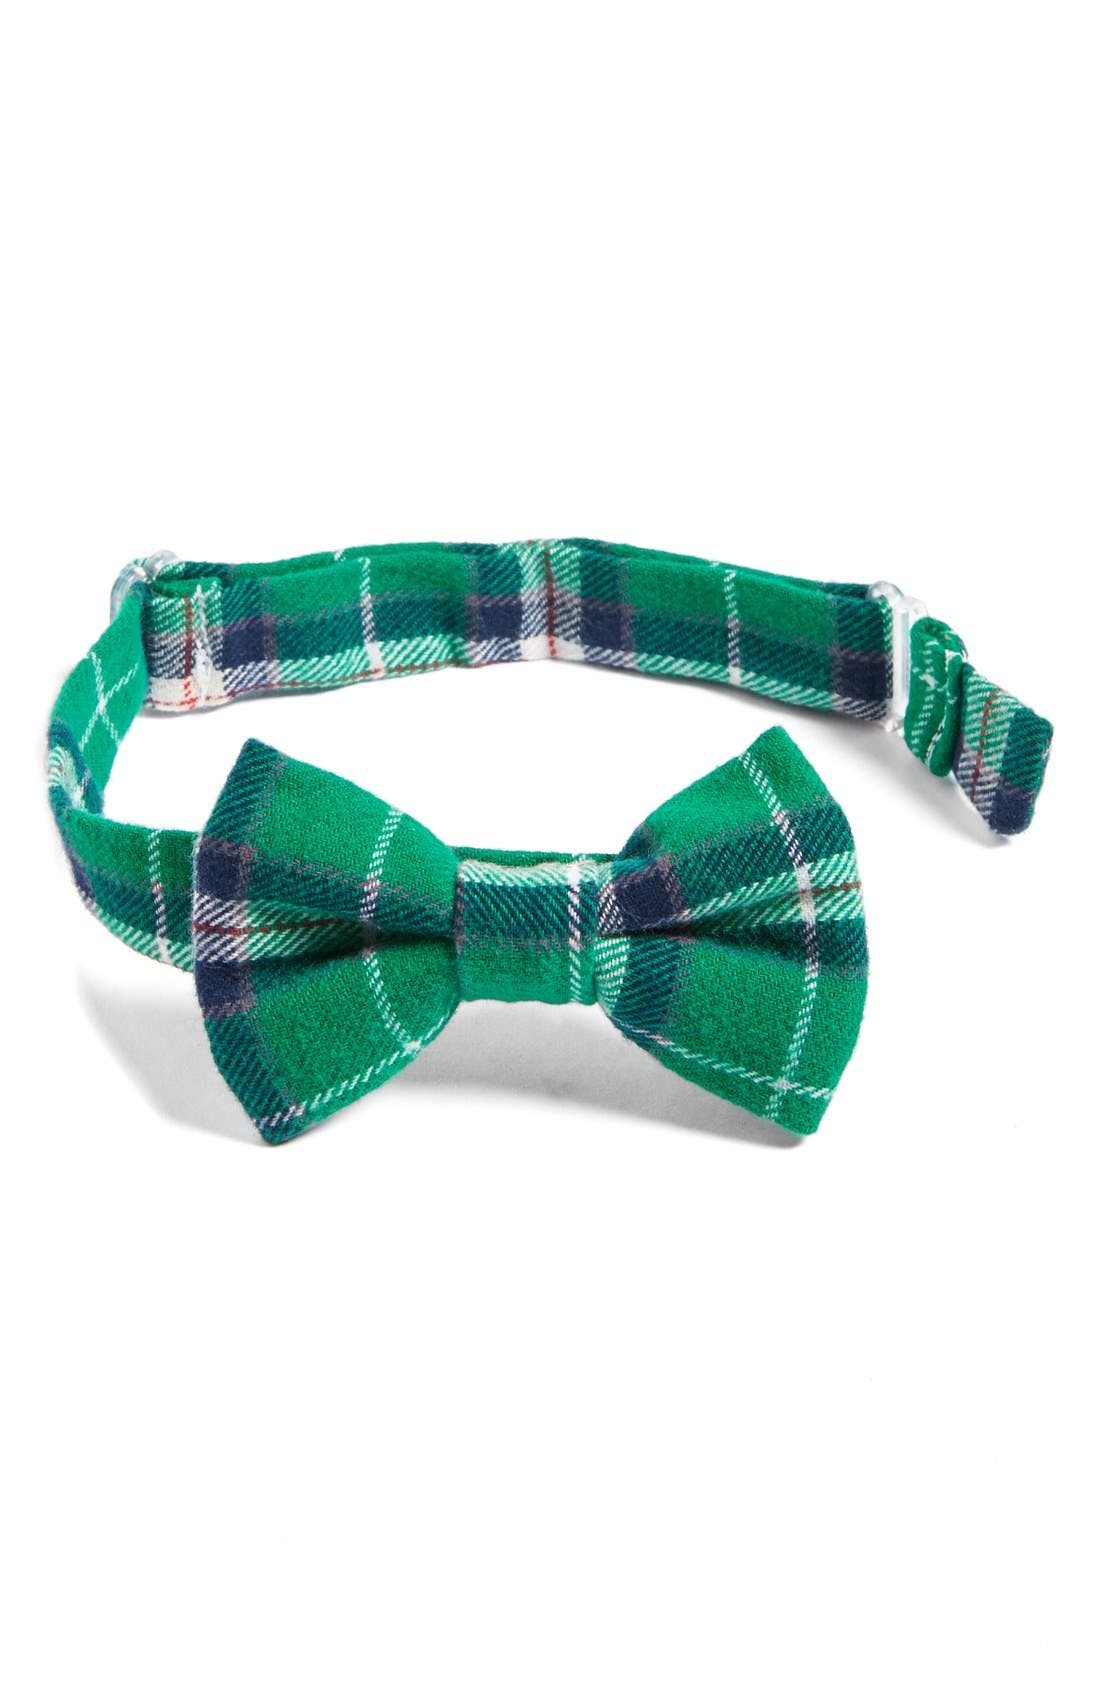 Main Image - Baby Bow Tie Plaid Cotton Bow Tie (Baby Boys)